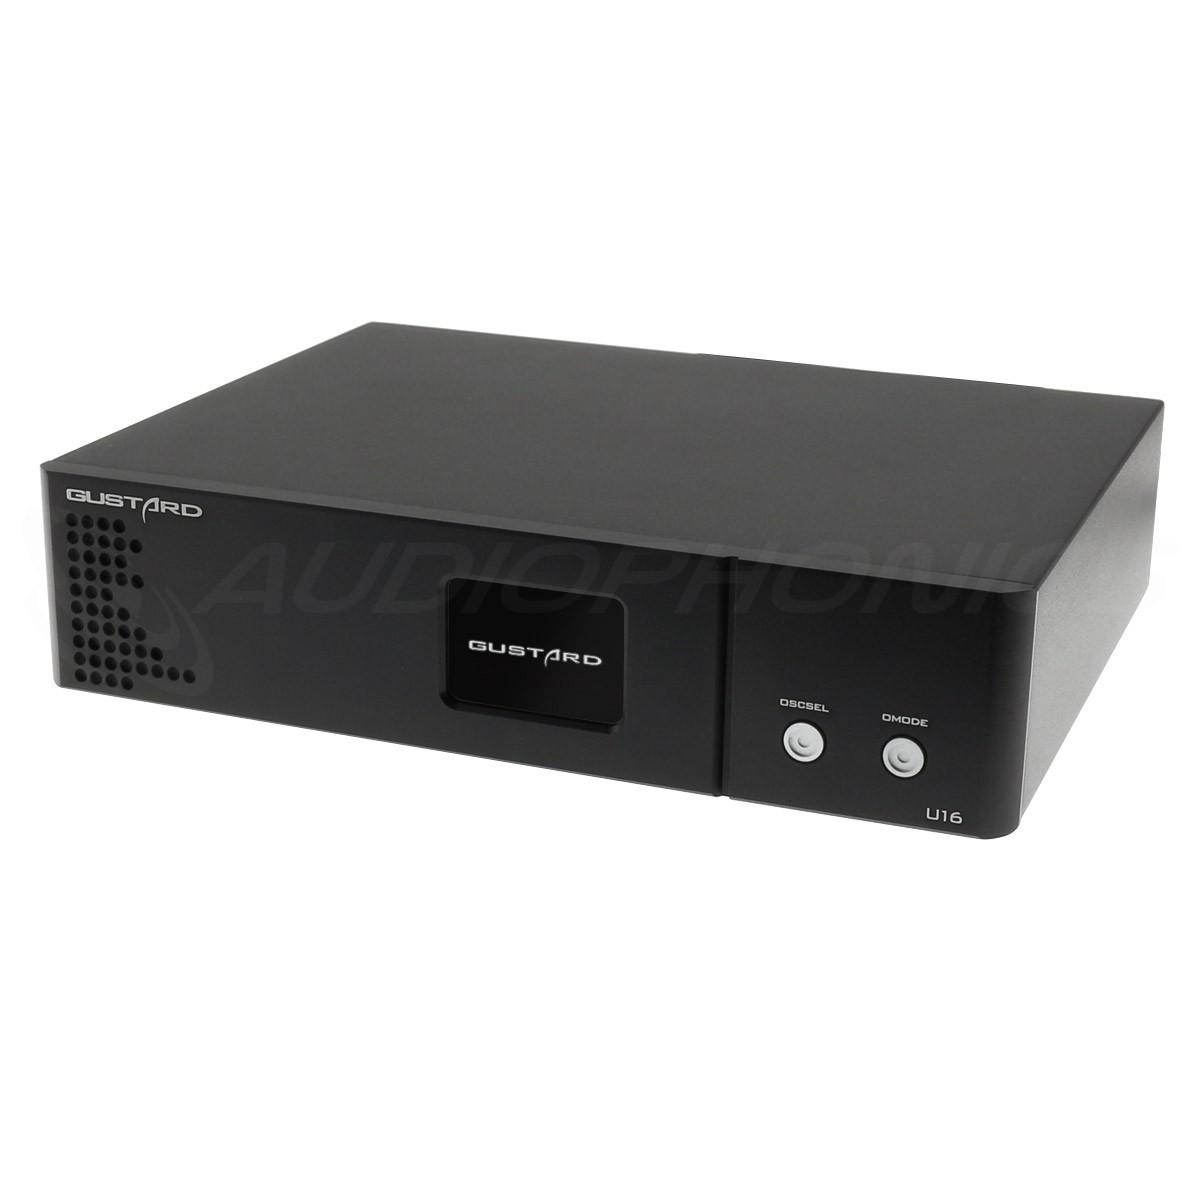 GUSTARD U16 Interface Digitale USB ES8620 SPDIF AES/EBU I2S HDMI LVDS Accusilicon 32bit 384kHz DSD512